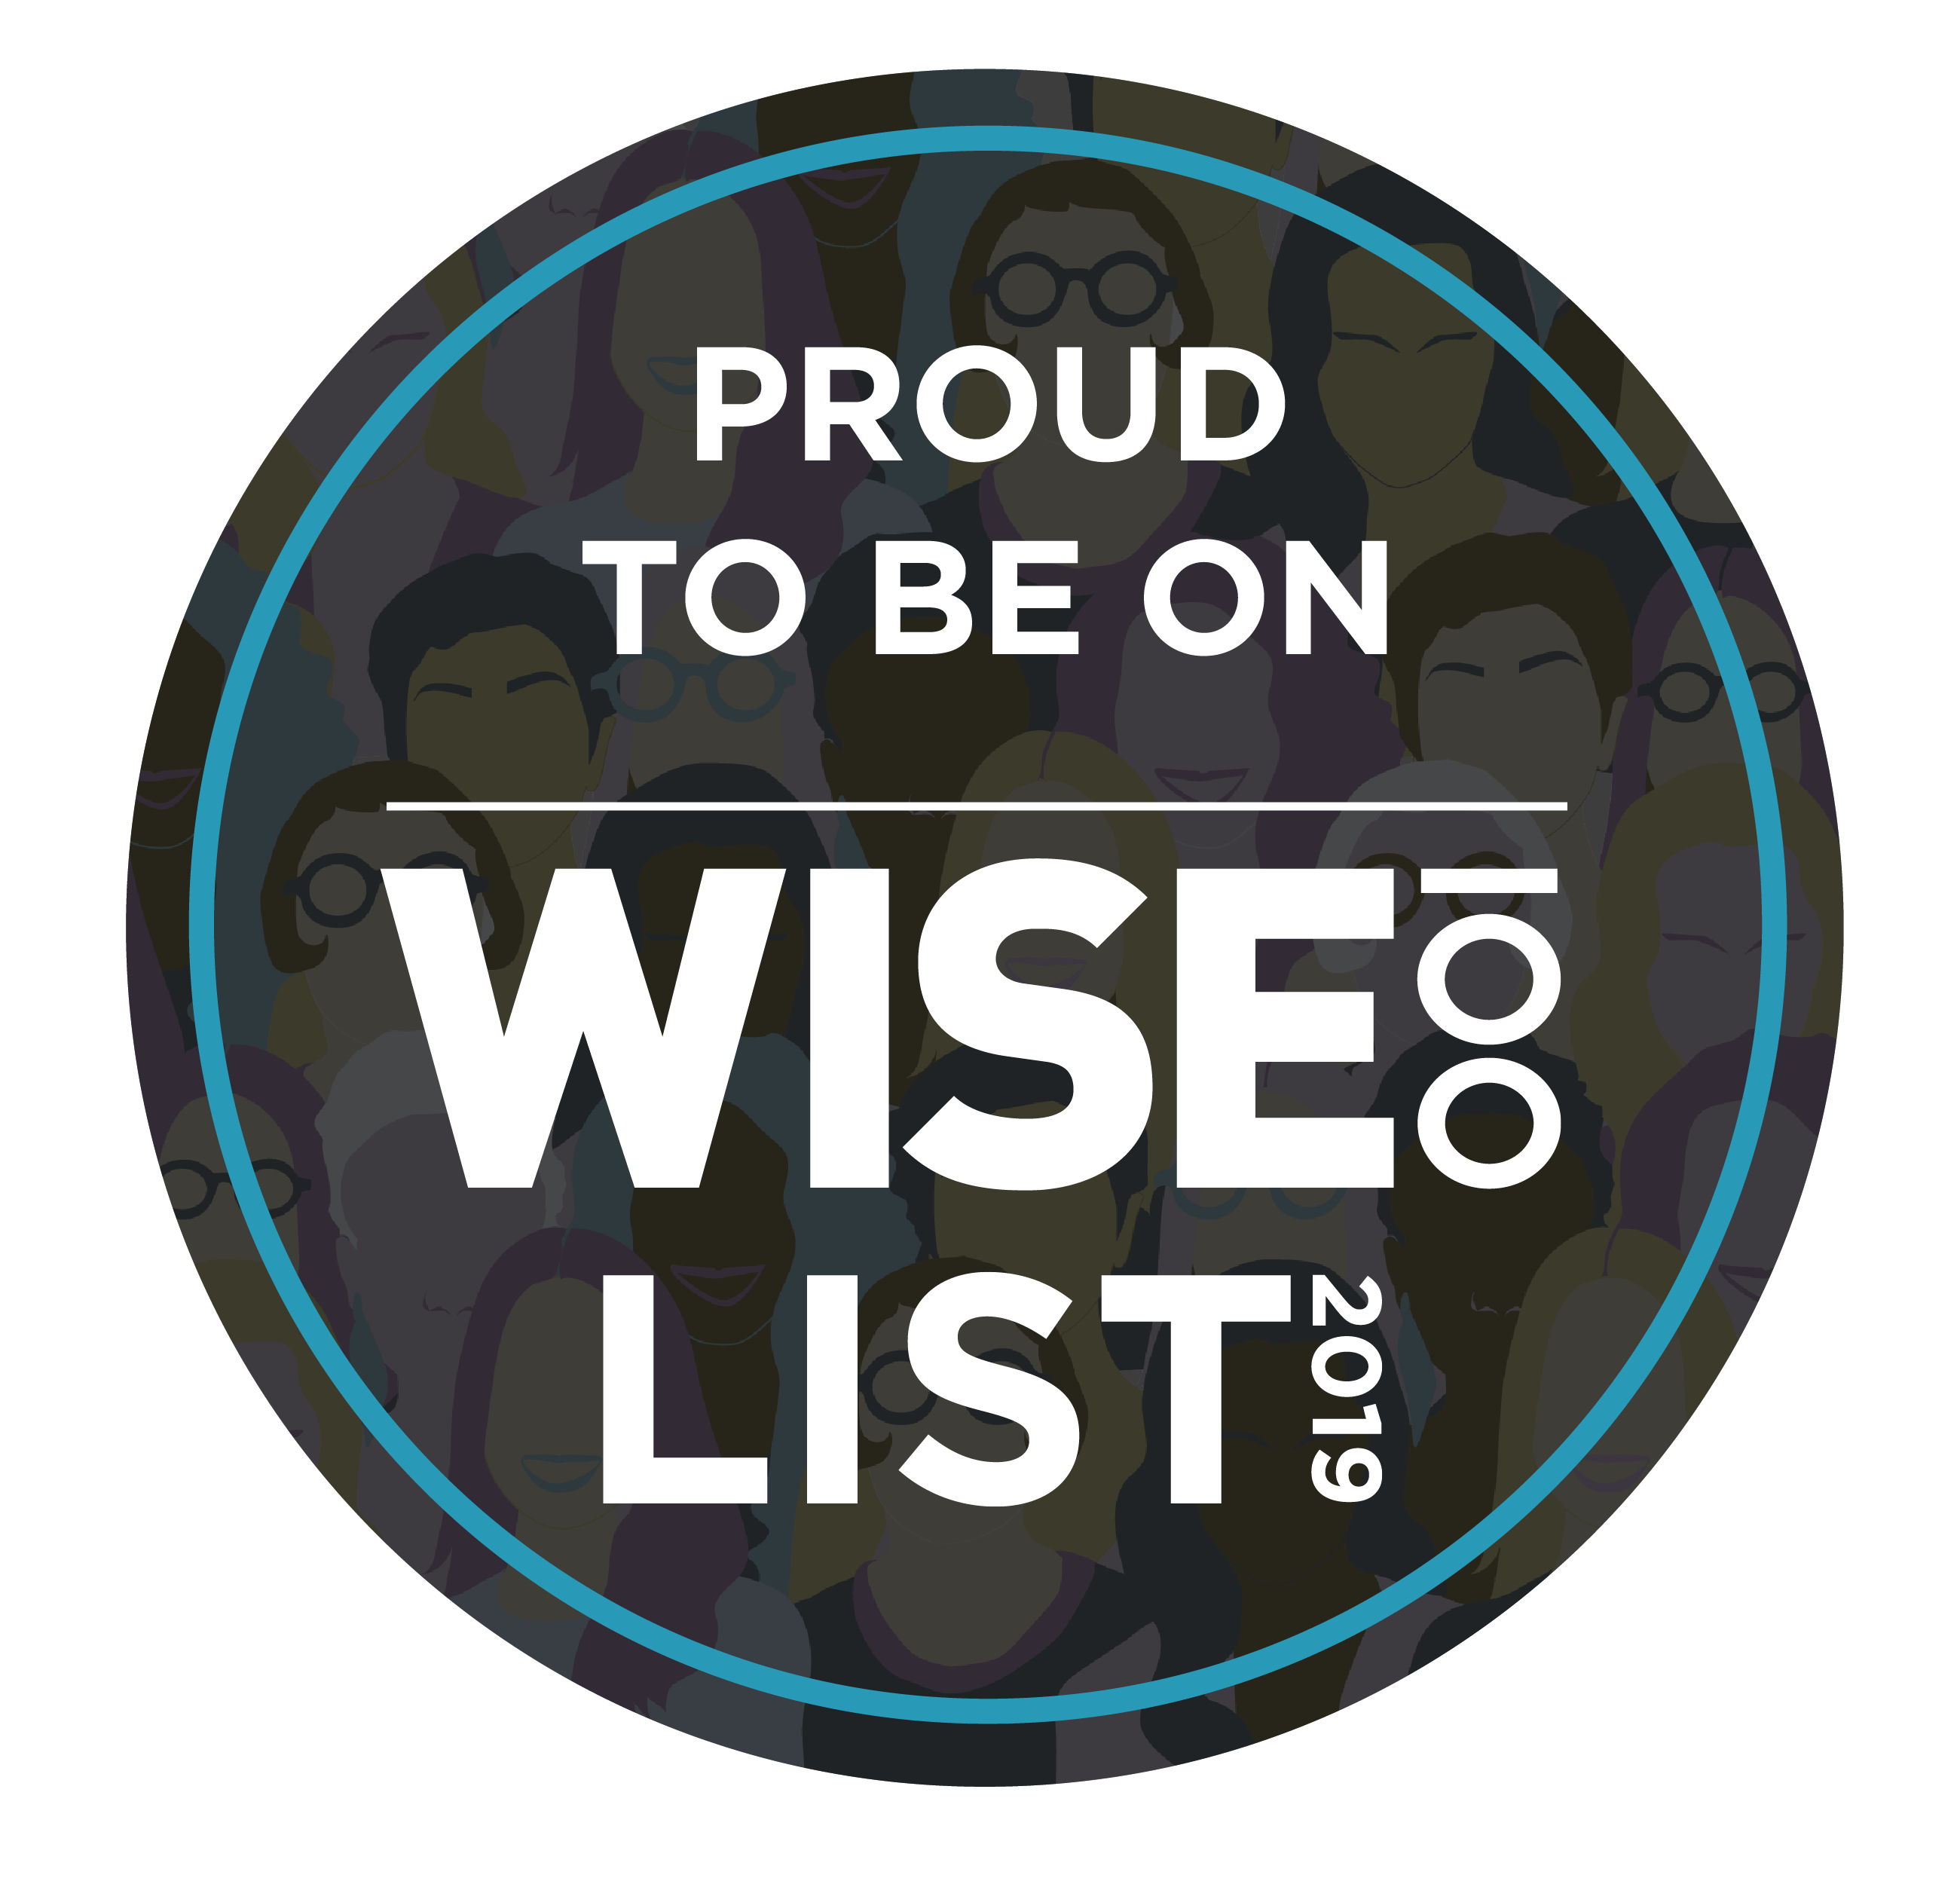 Wise 100 List 2019 badge